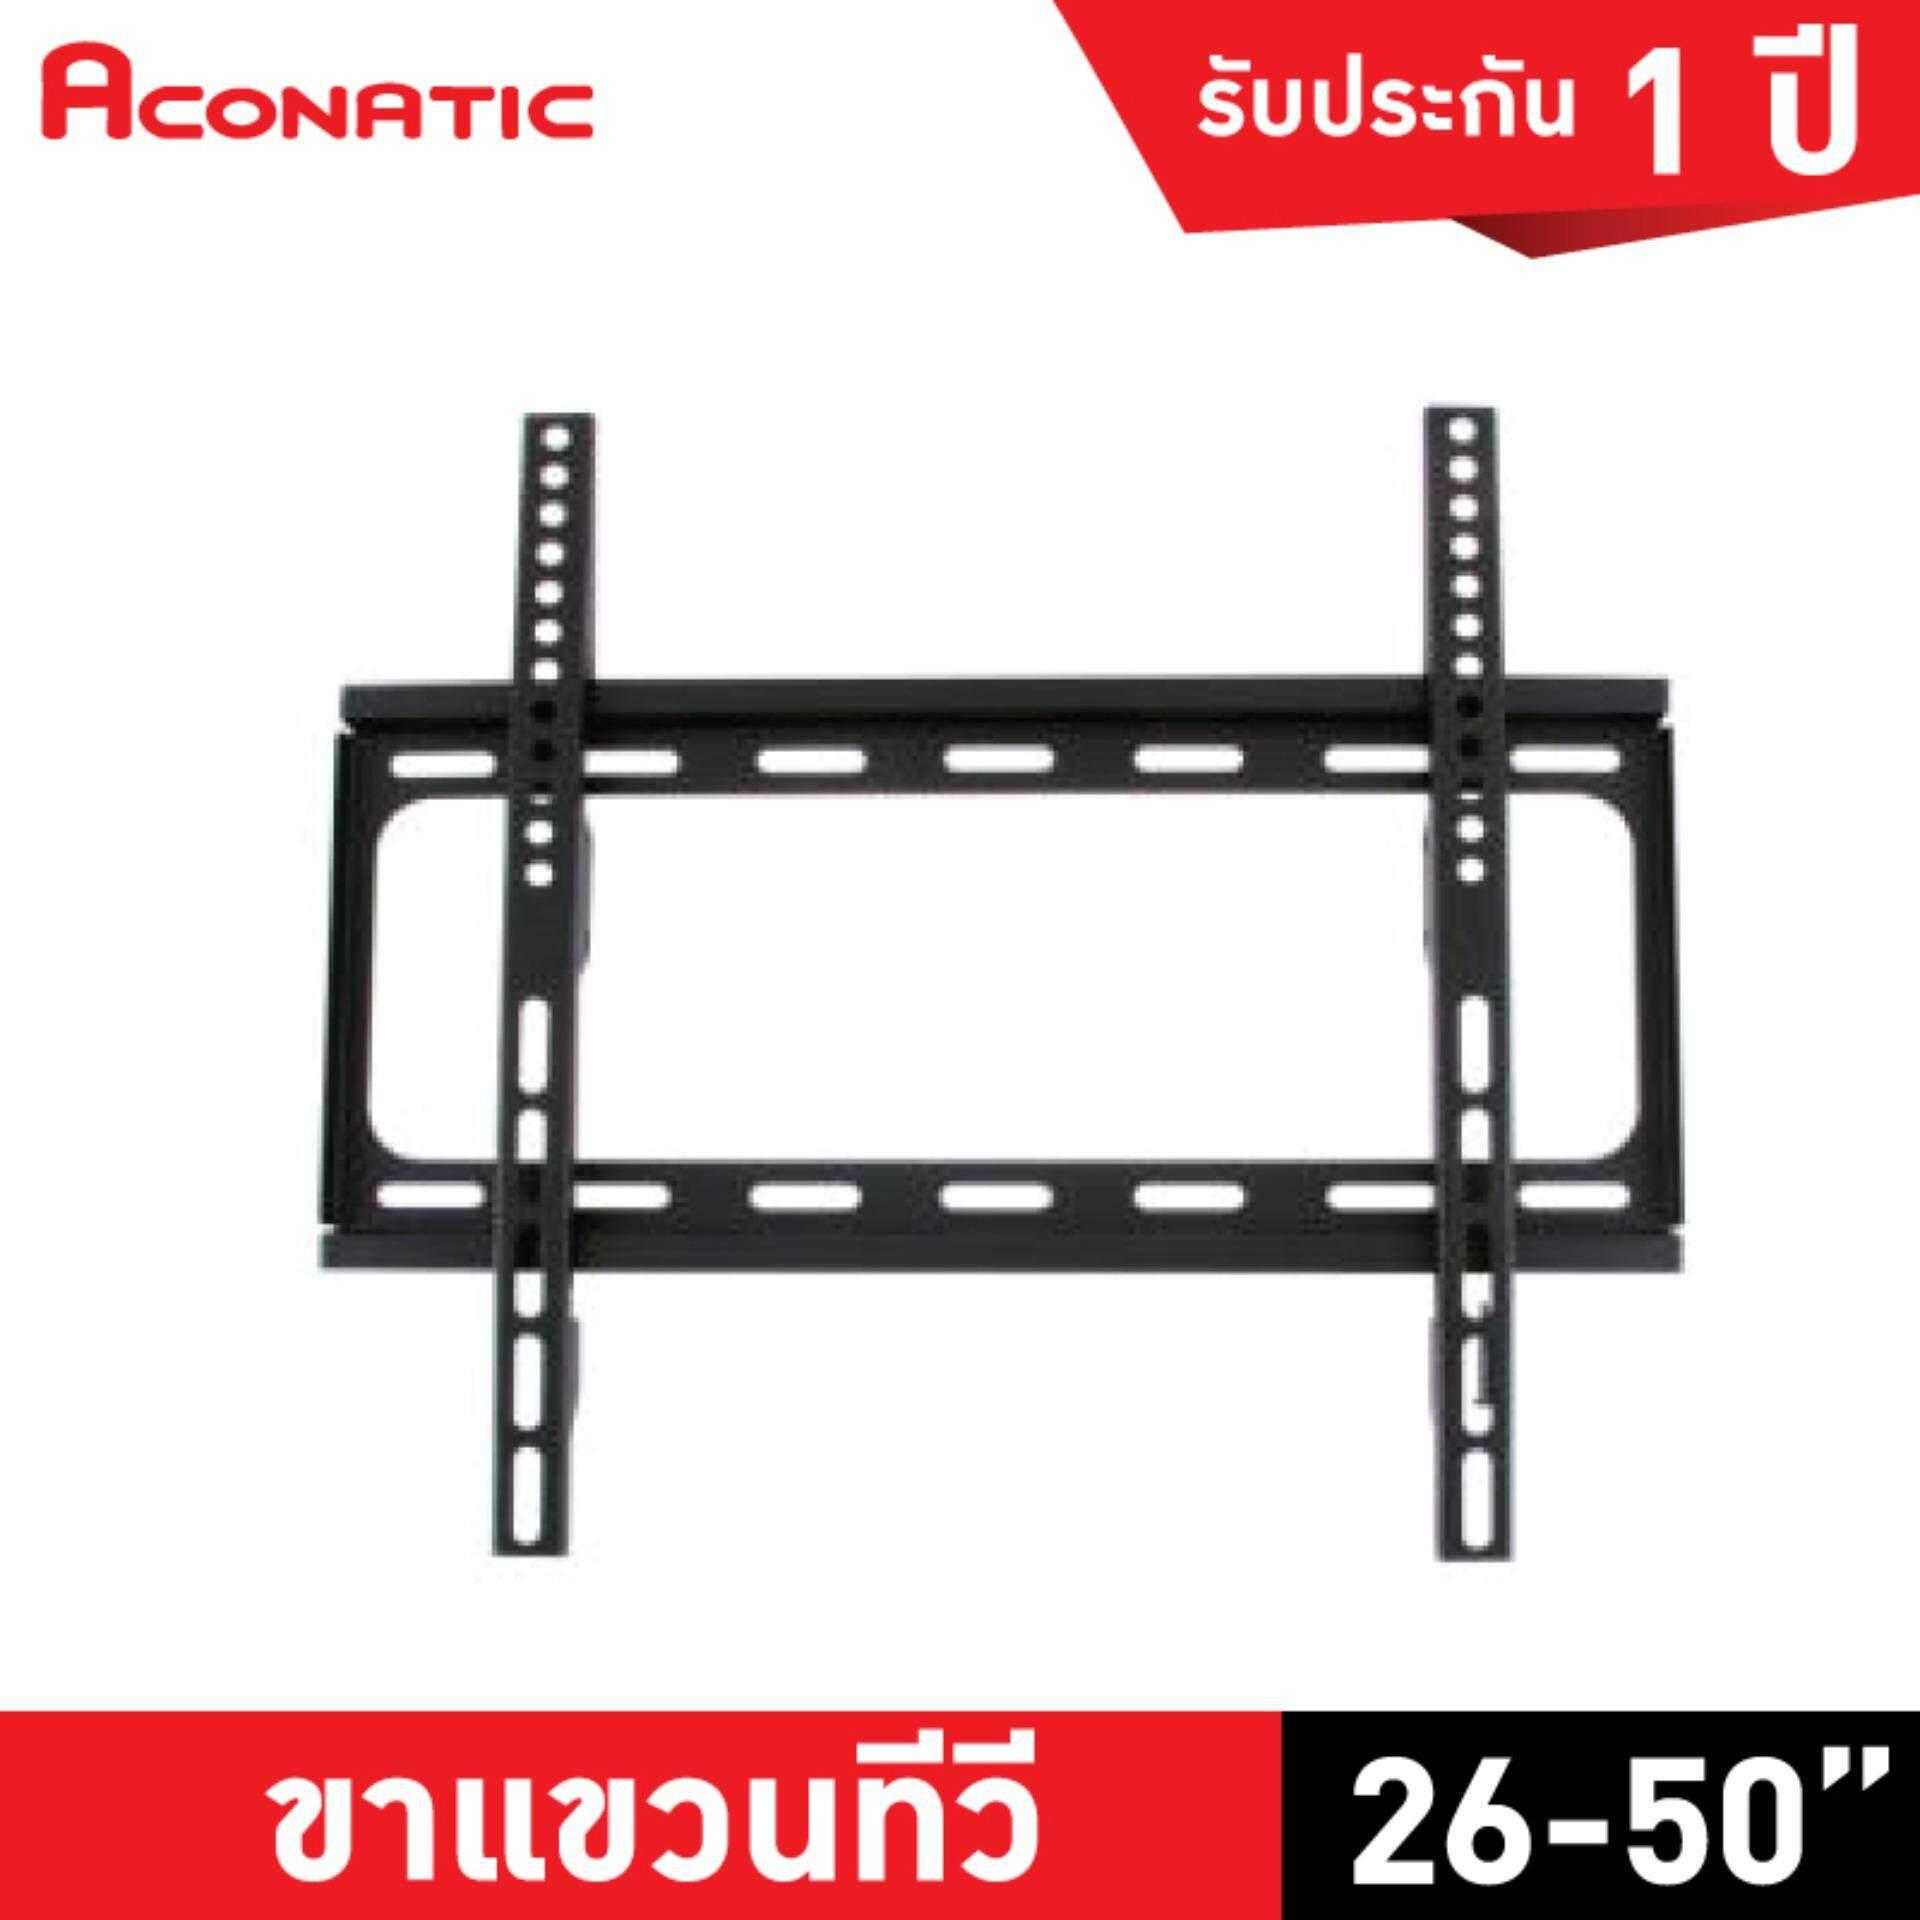 Aconatic ขาแขวนทีวี รุ่น An-Tv2650f By The I-Life.